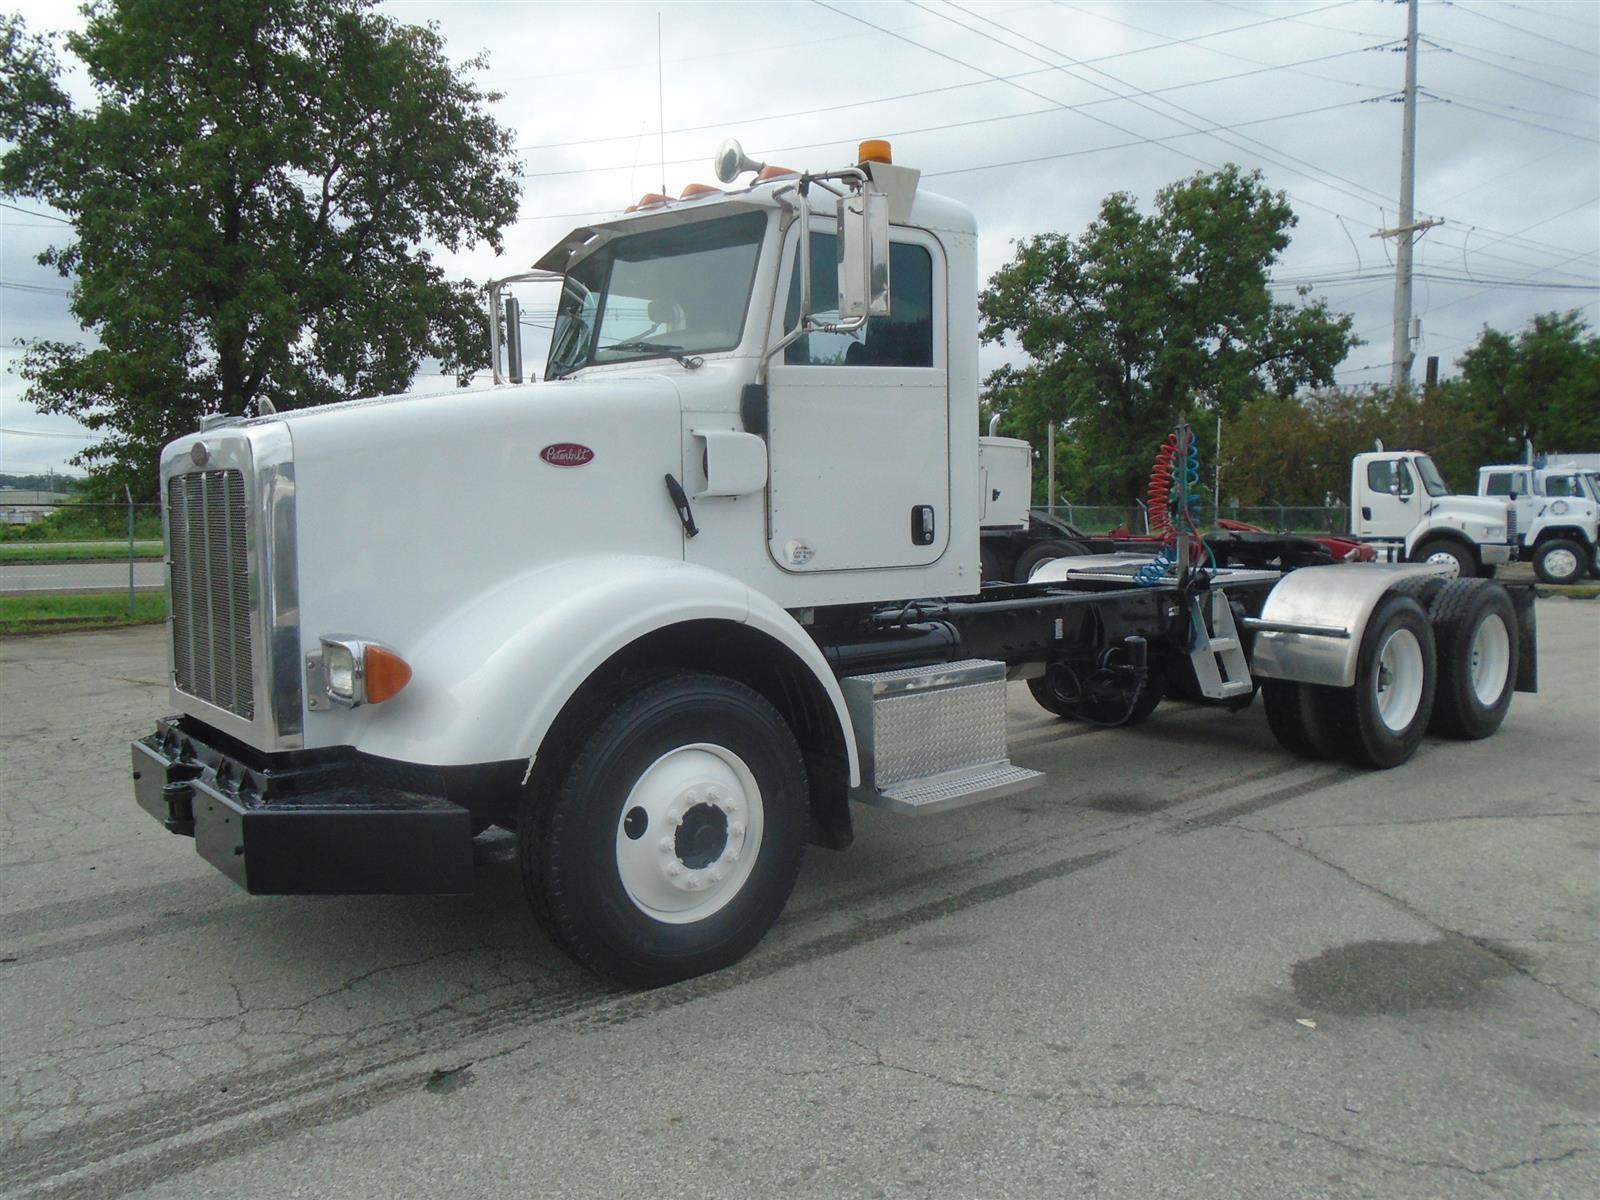 2012 Peterbilt 365 Day Cab 6x4, Tractor #29056 - photo 1